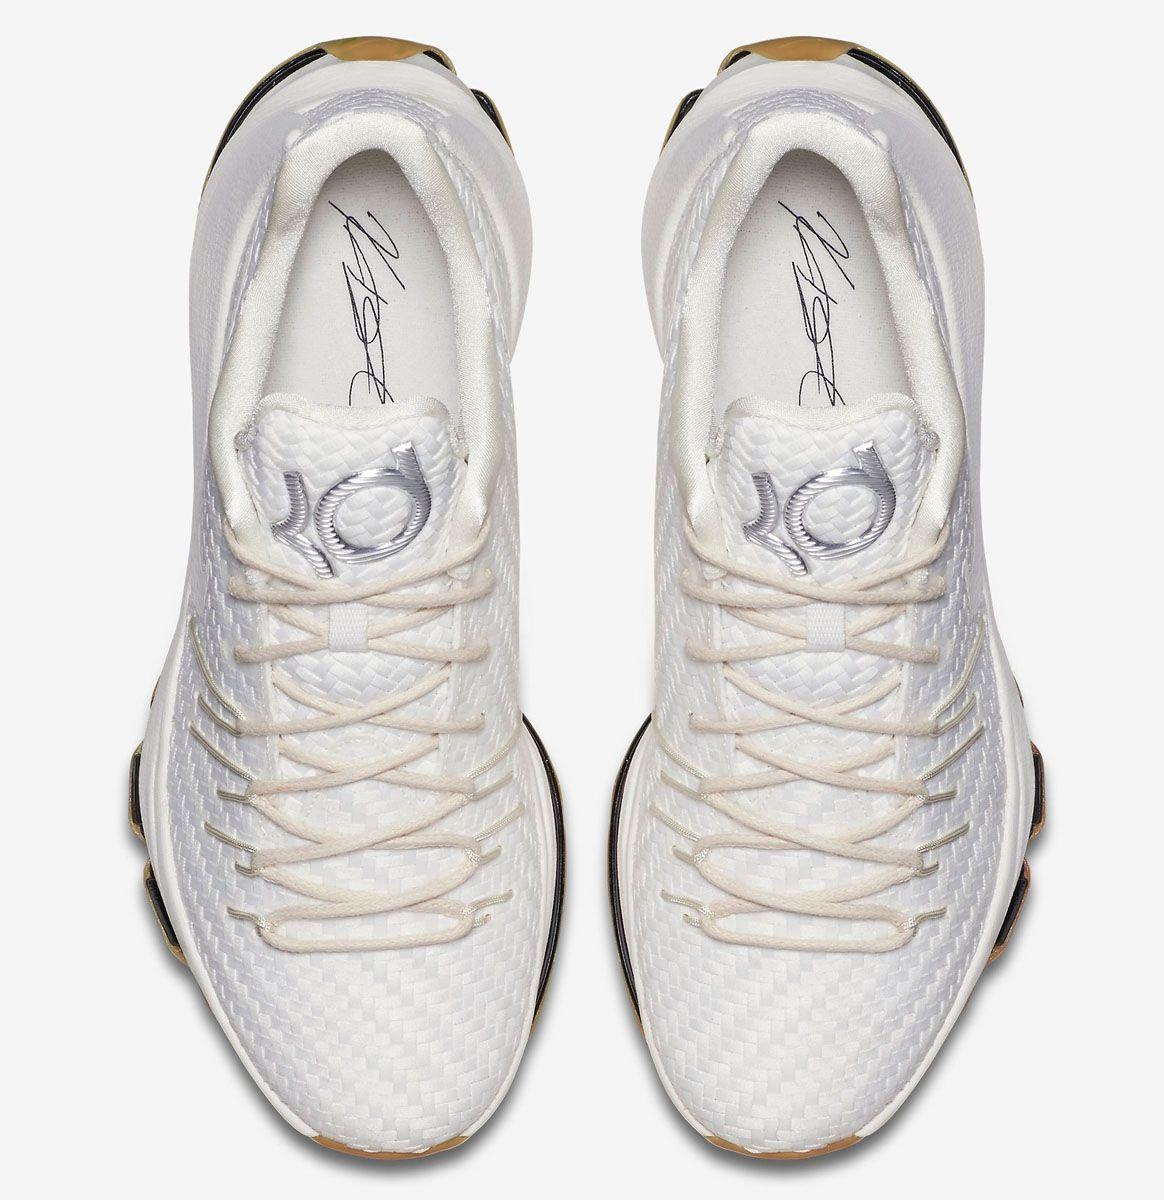 27f578f78431 Nike KD 8 EXT  White Woven